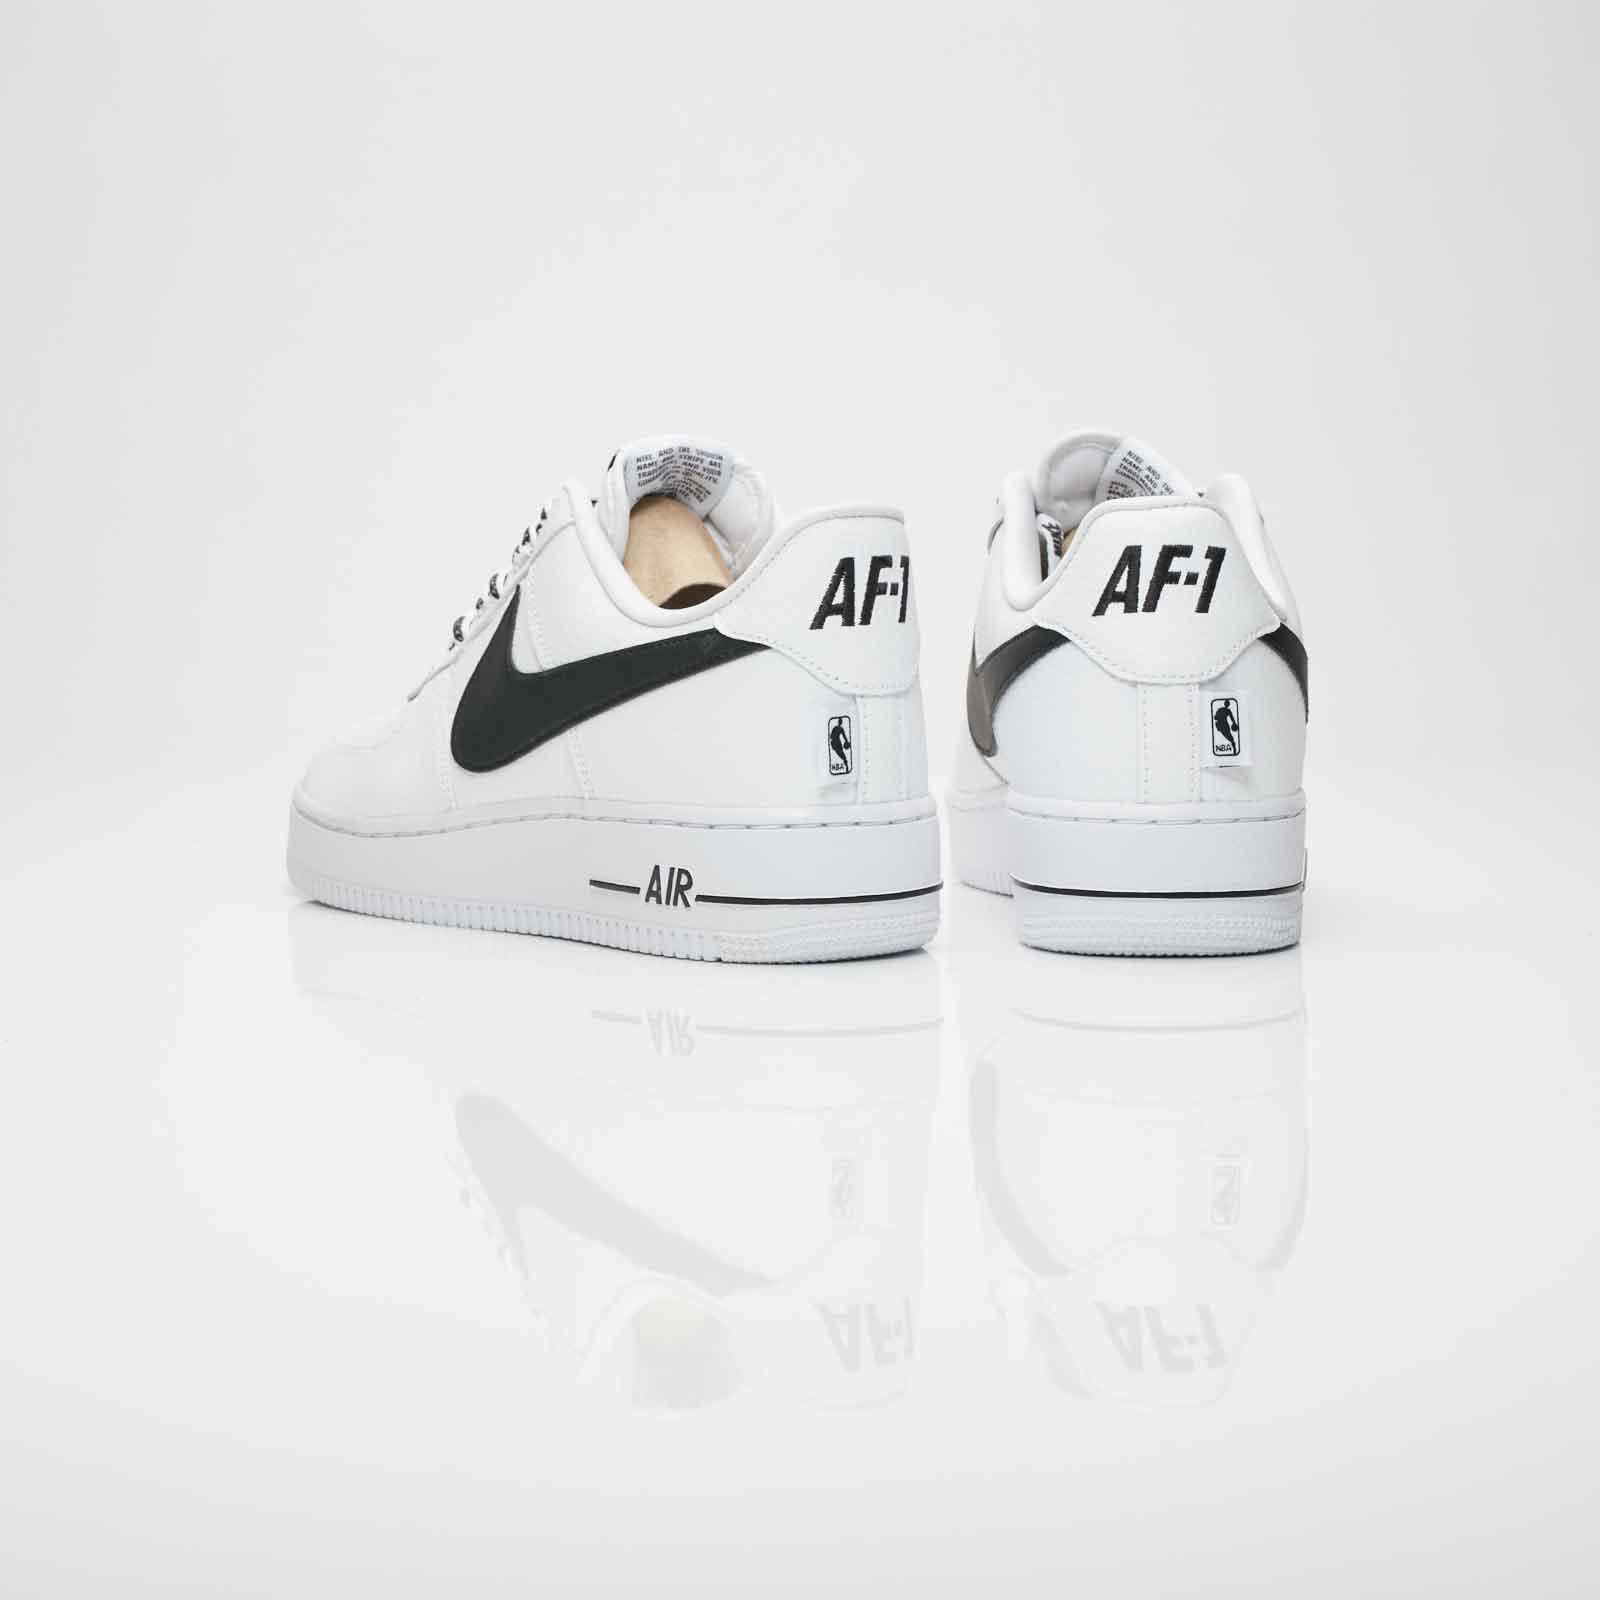 cienie najnowszy projekt super jakość Nike Air Force 1 07 Lv8 - 823511-103 - Sneakersnstuff ...